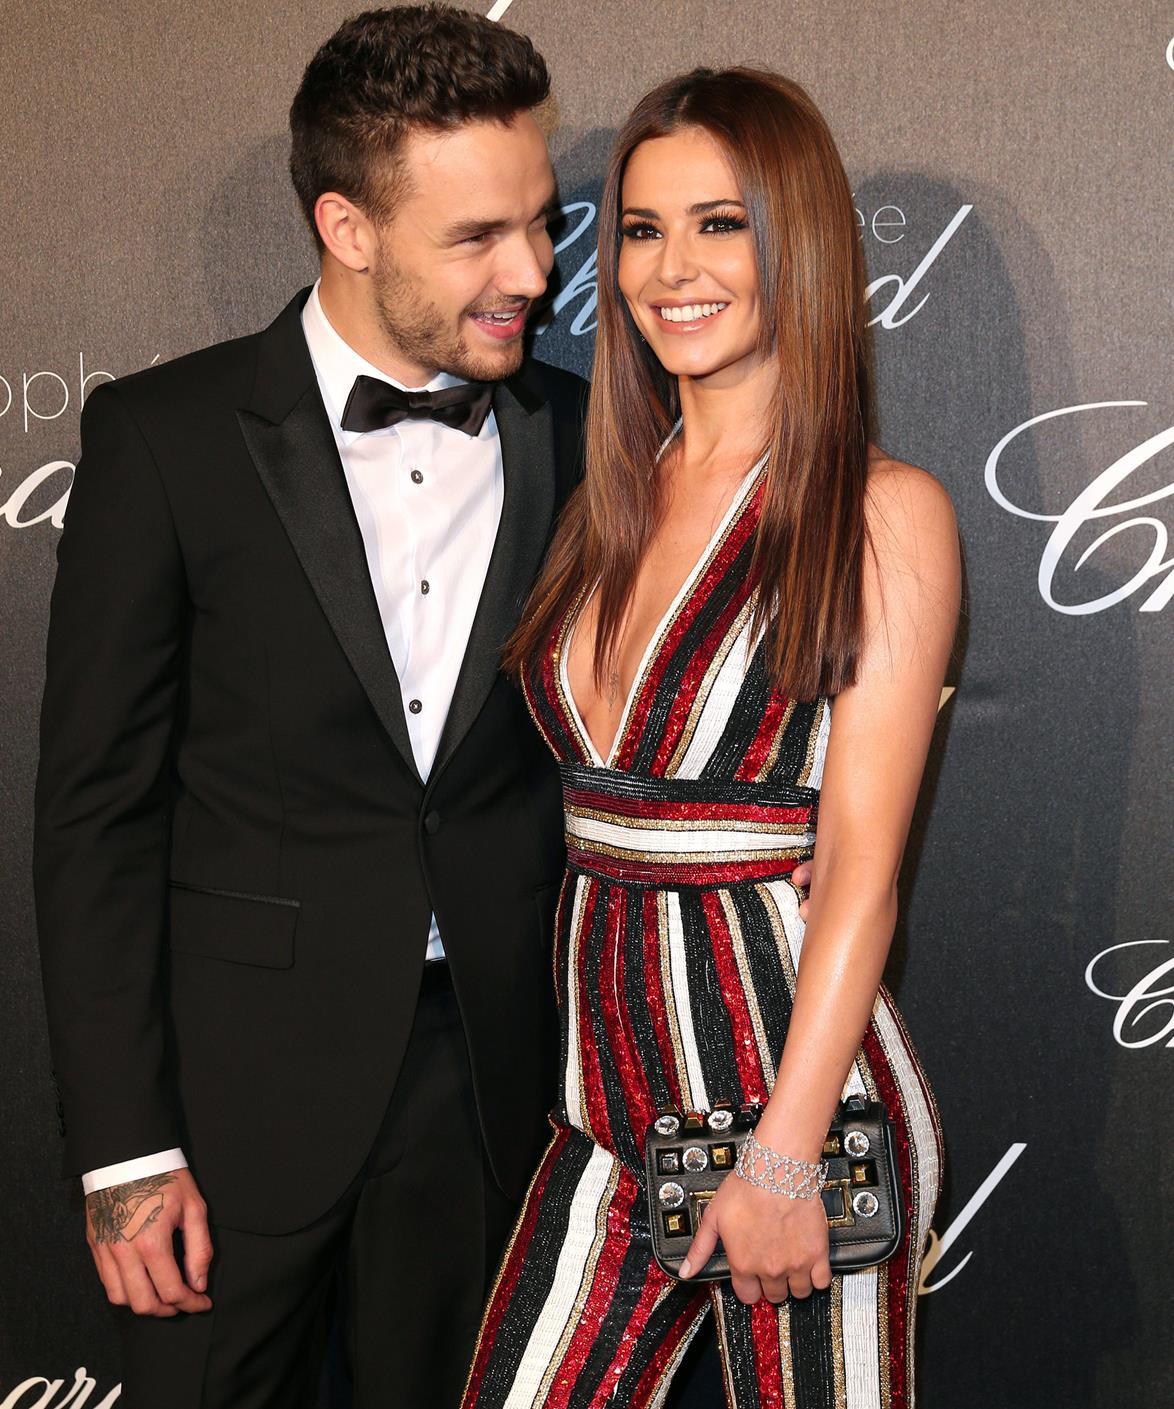 Cheryl's divorce is officially finalised from Jean-Bernard Fernandez-Versini